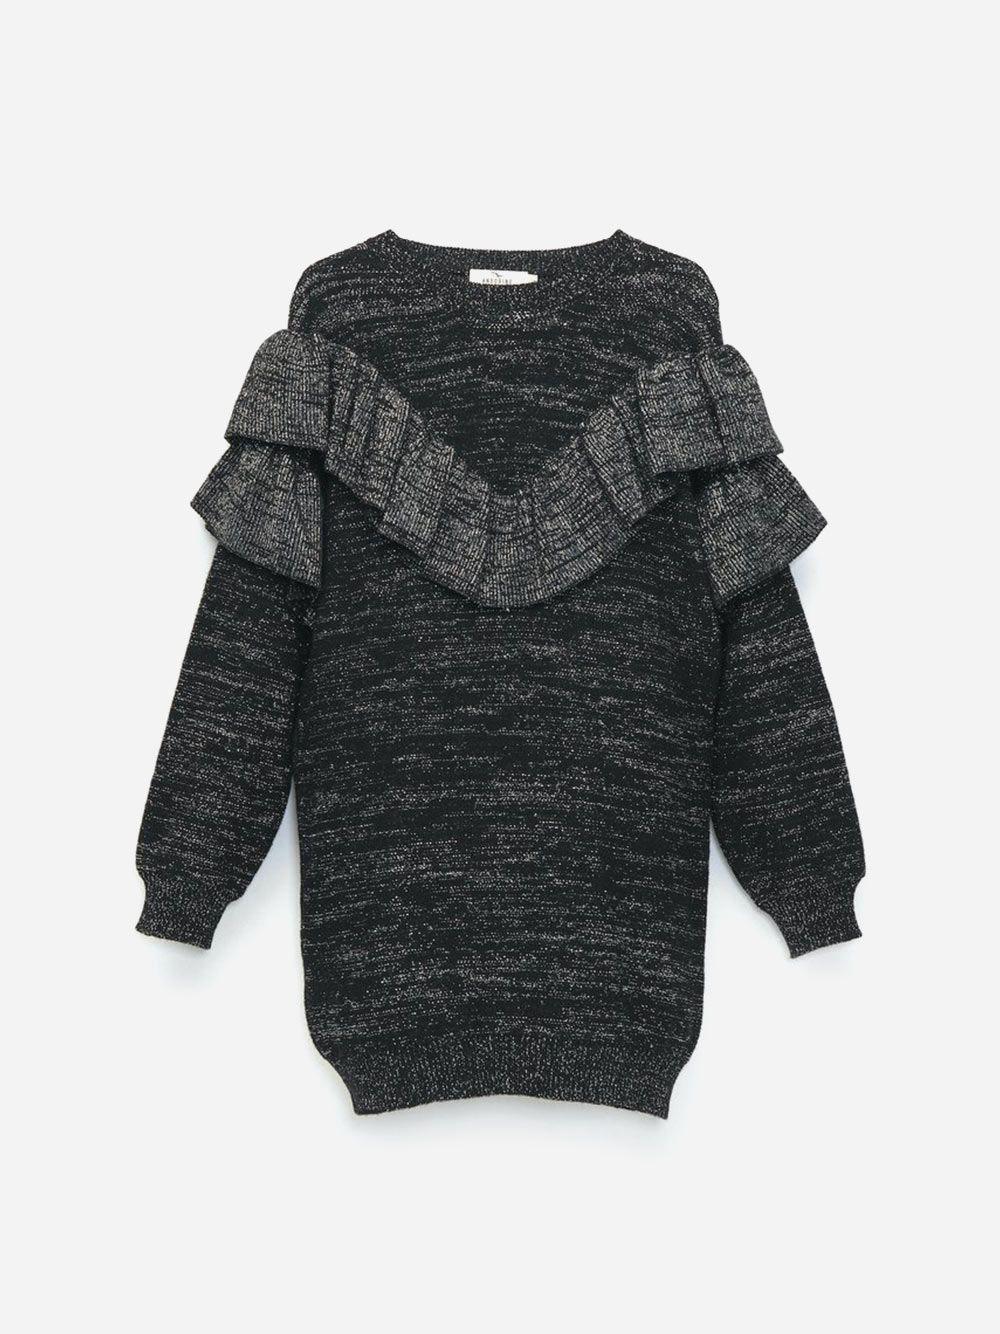 Ruffled Knitted Dress